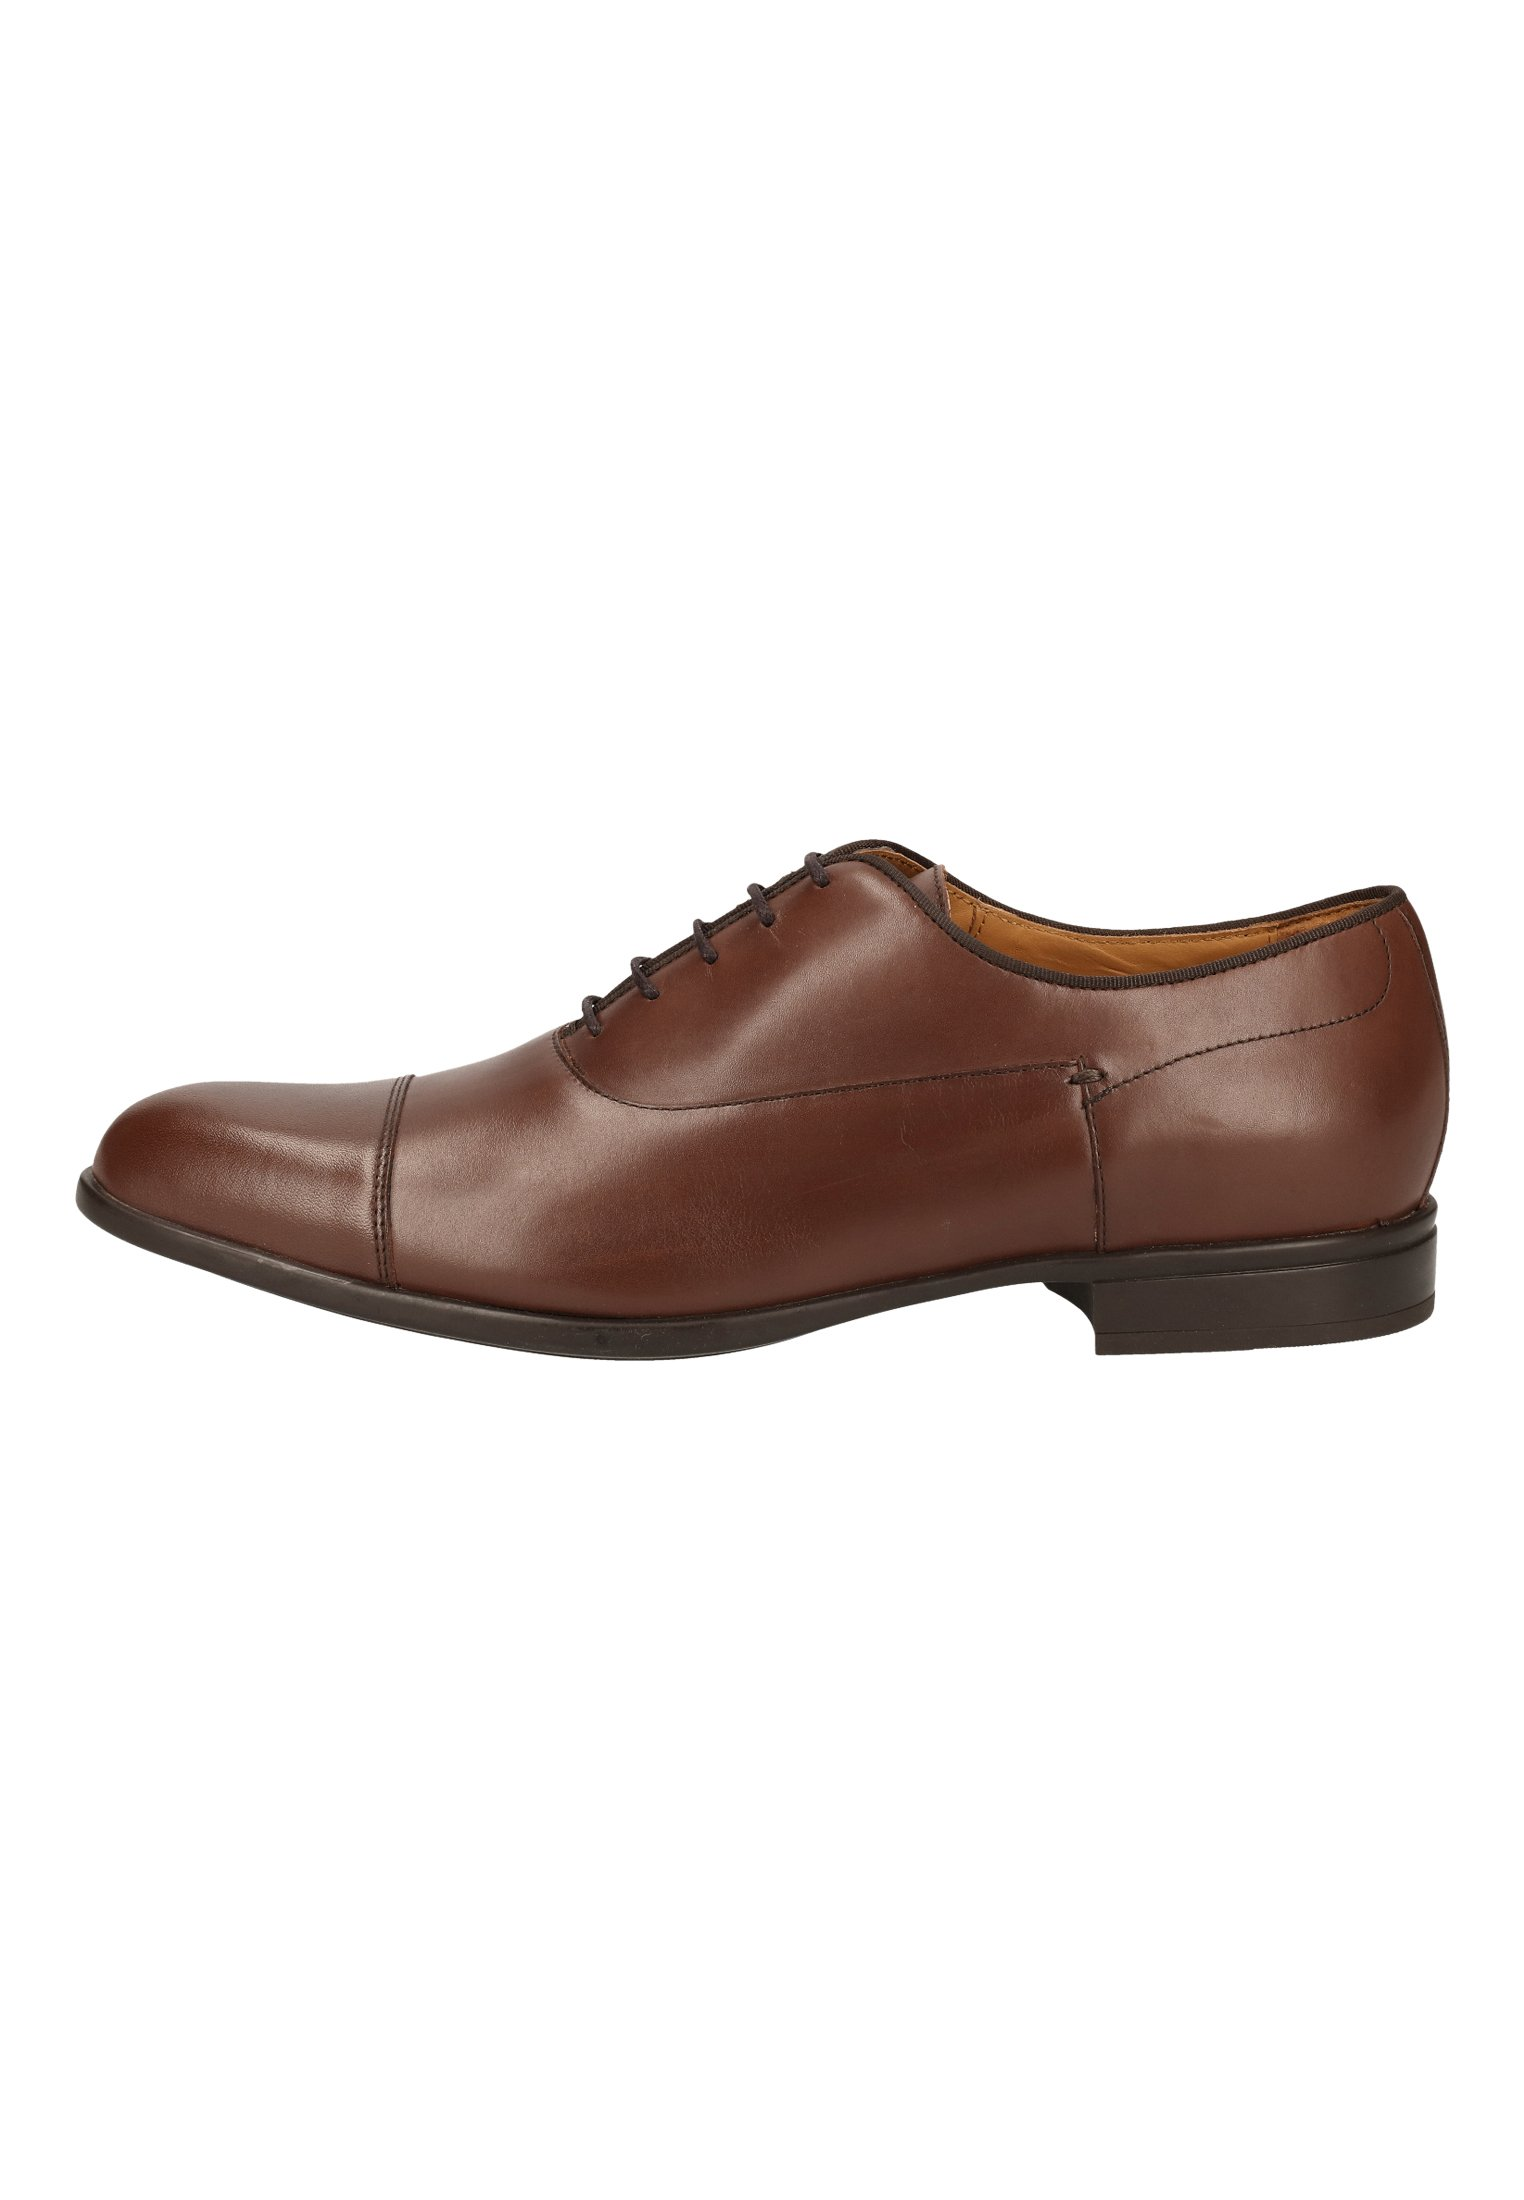 Geox Herren Business Schuhe online kaufen